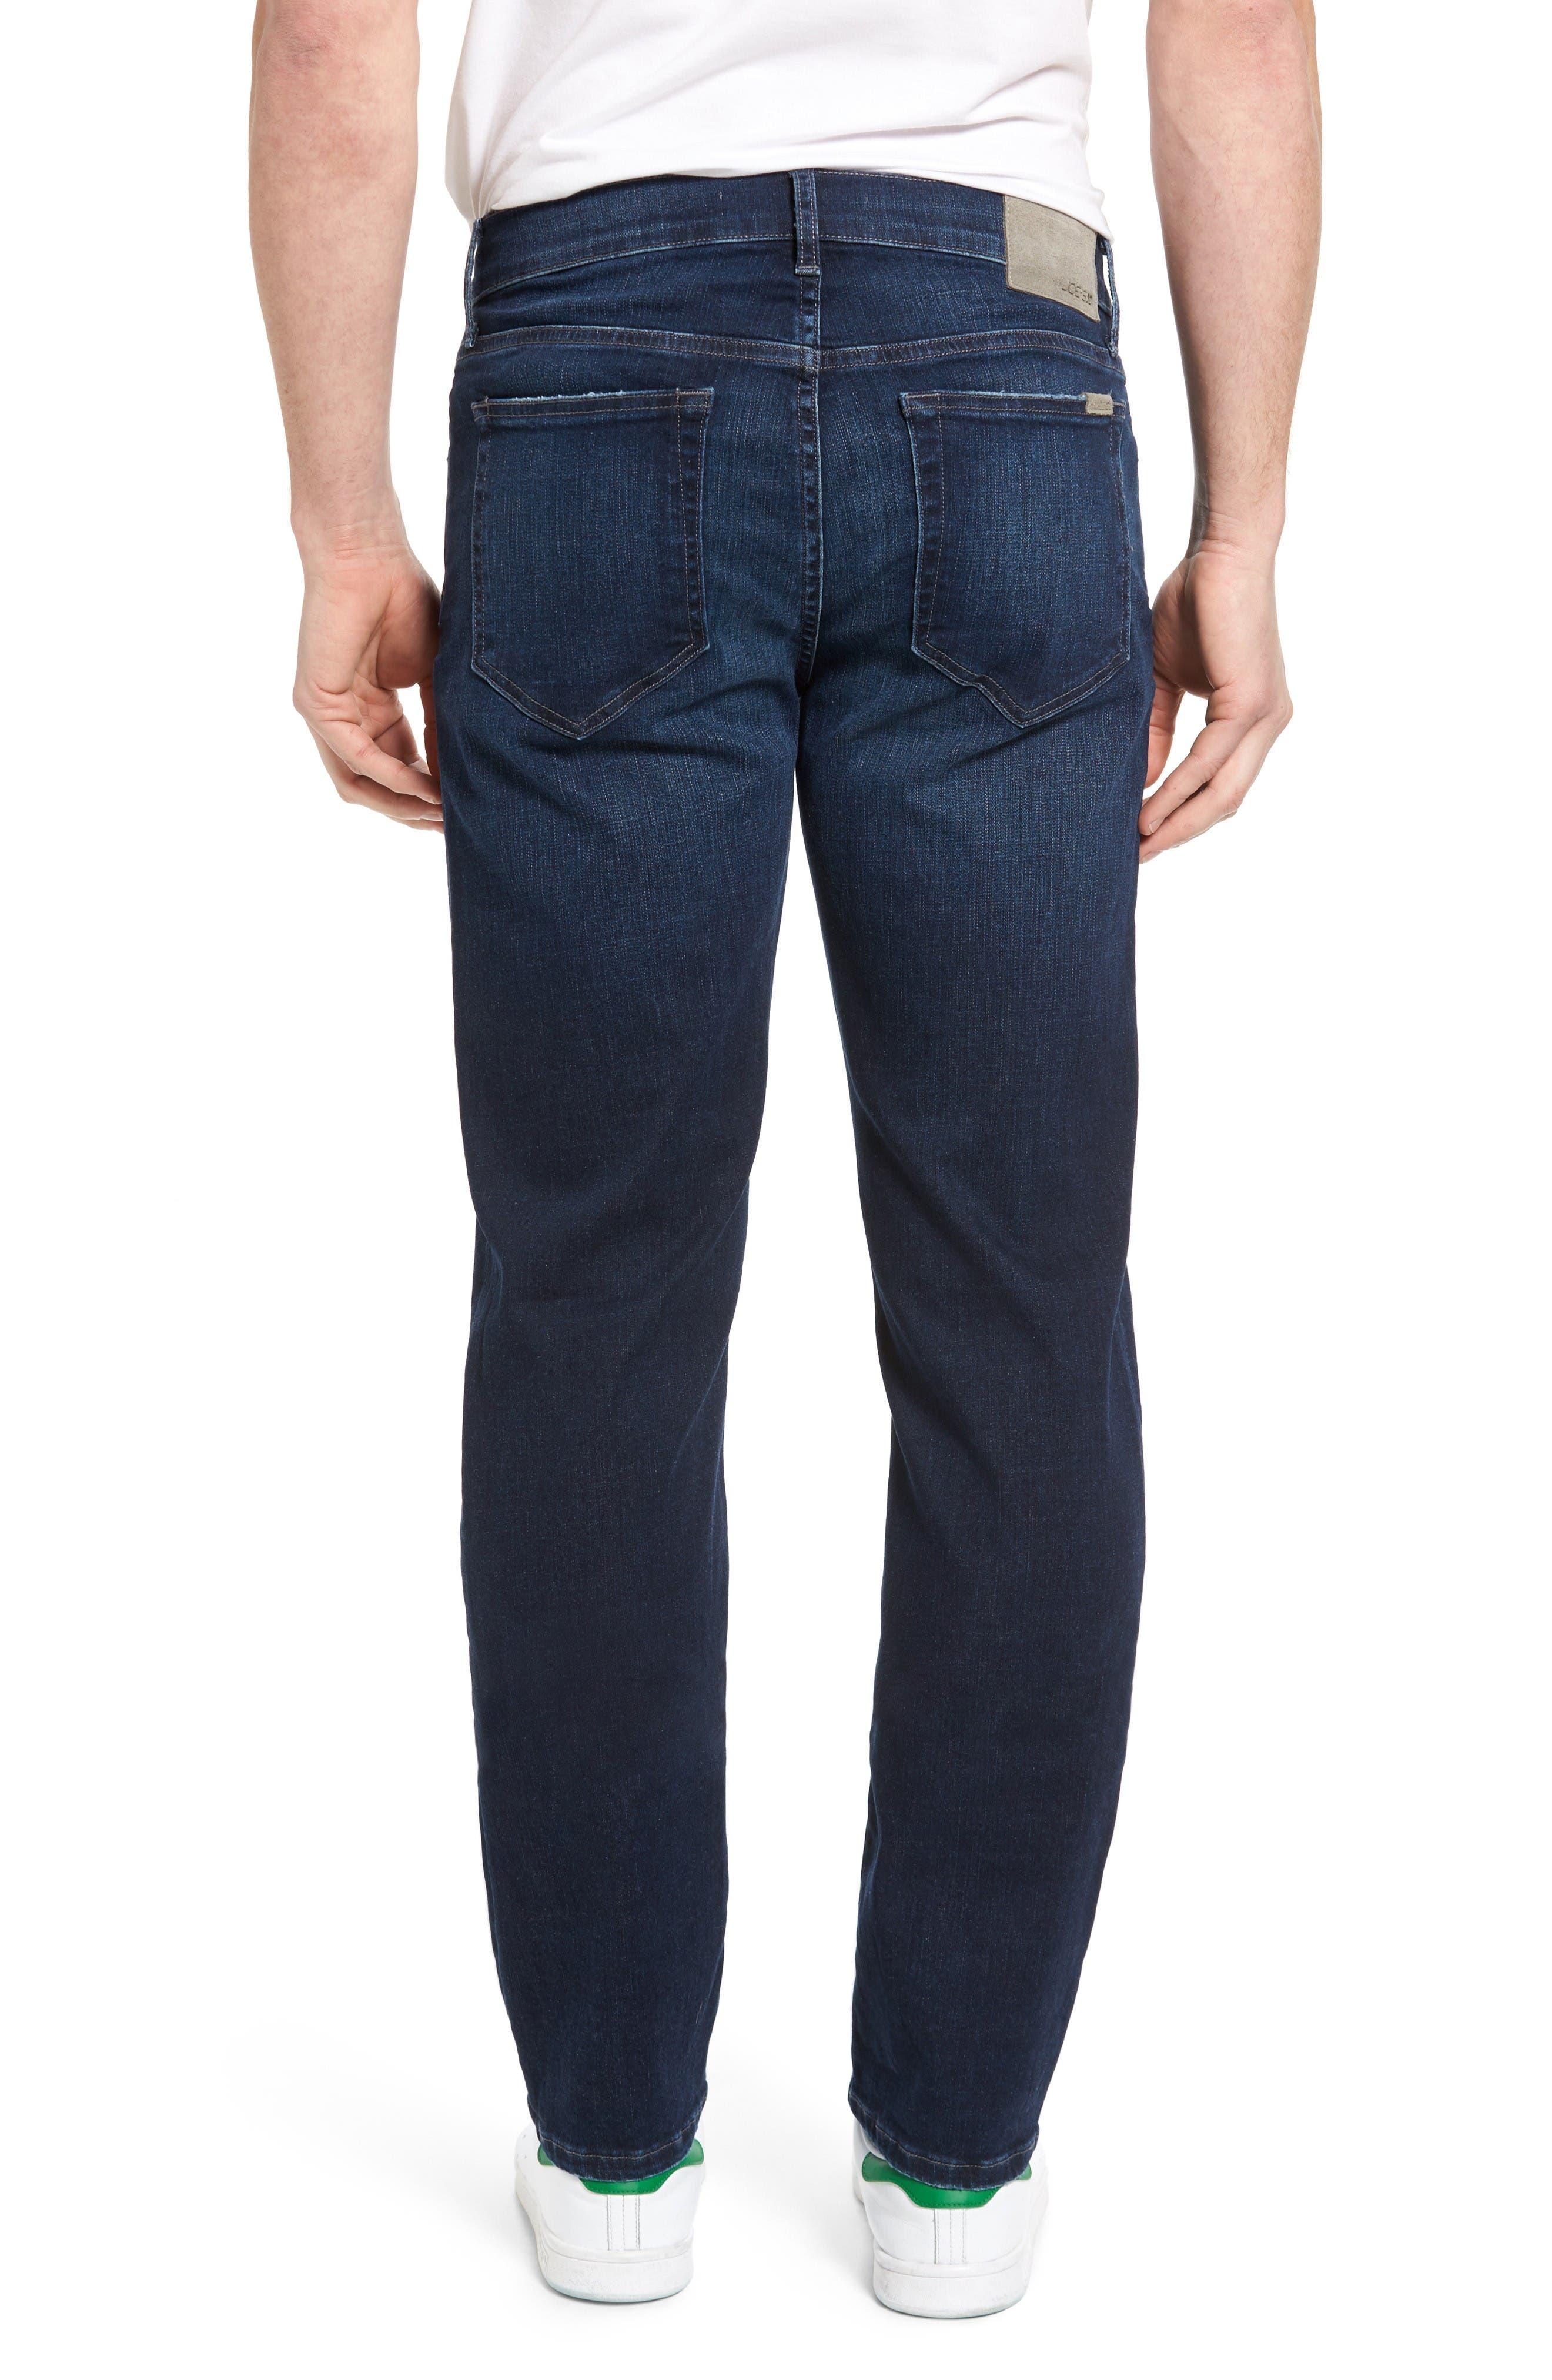 Brixton Kinetic Slim Straight Leg Jeans,                             Alternate thumbnail 2, color,                             Aedan